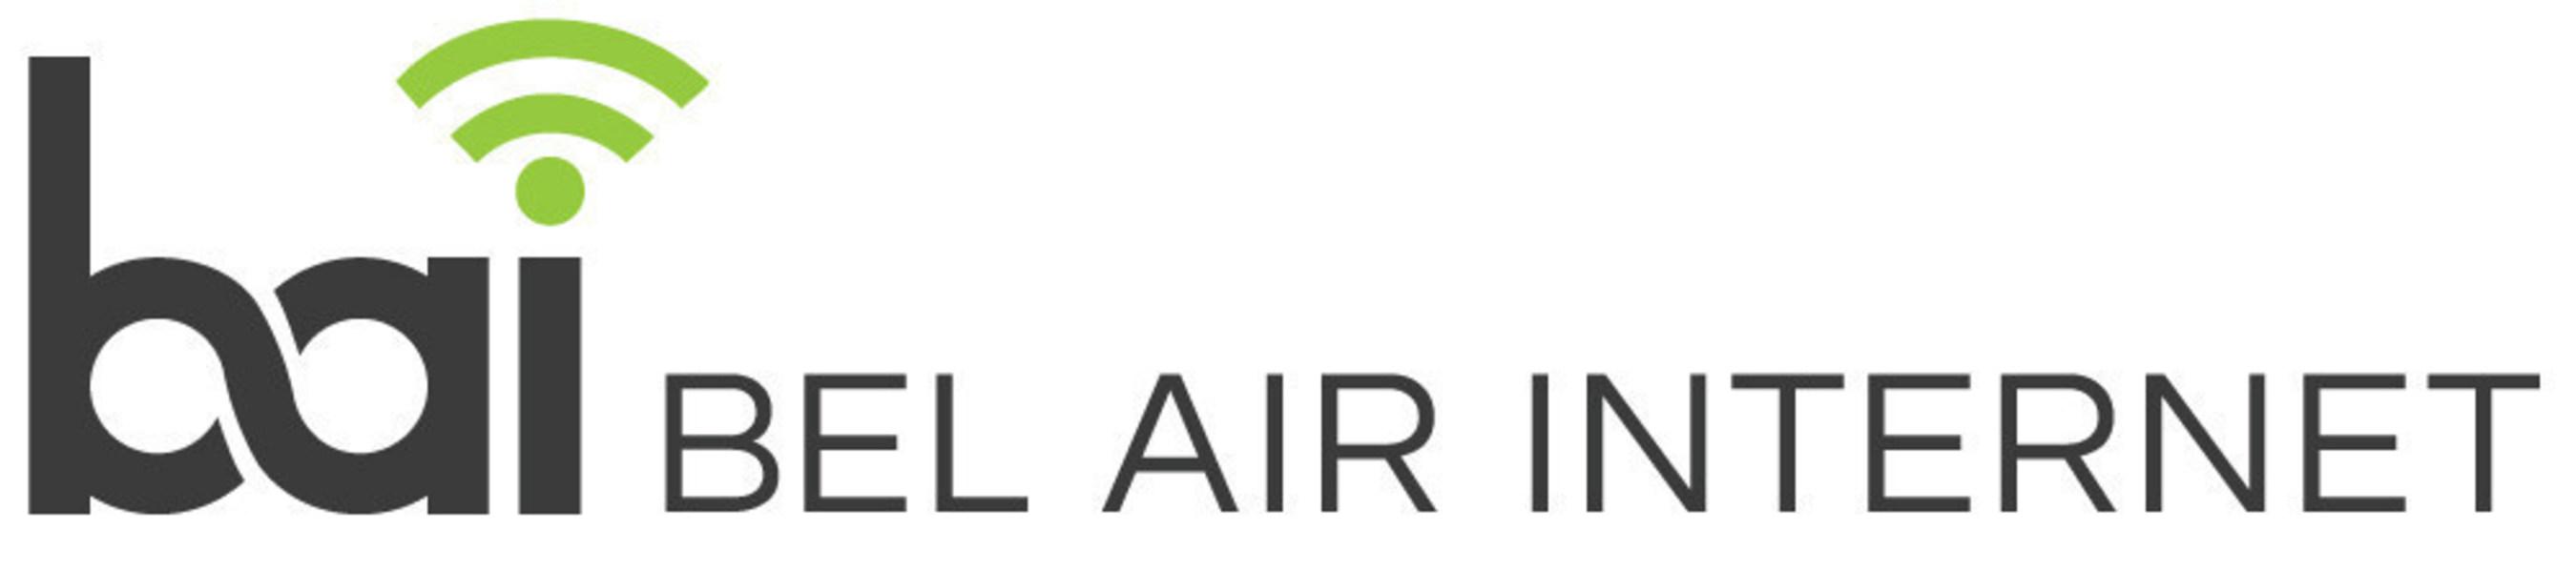 Bel Air Internet Logo